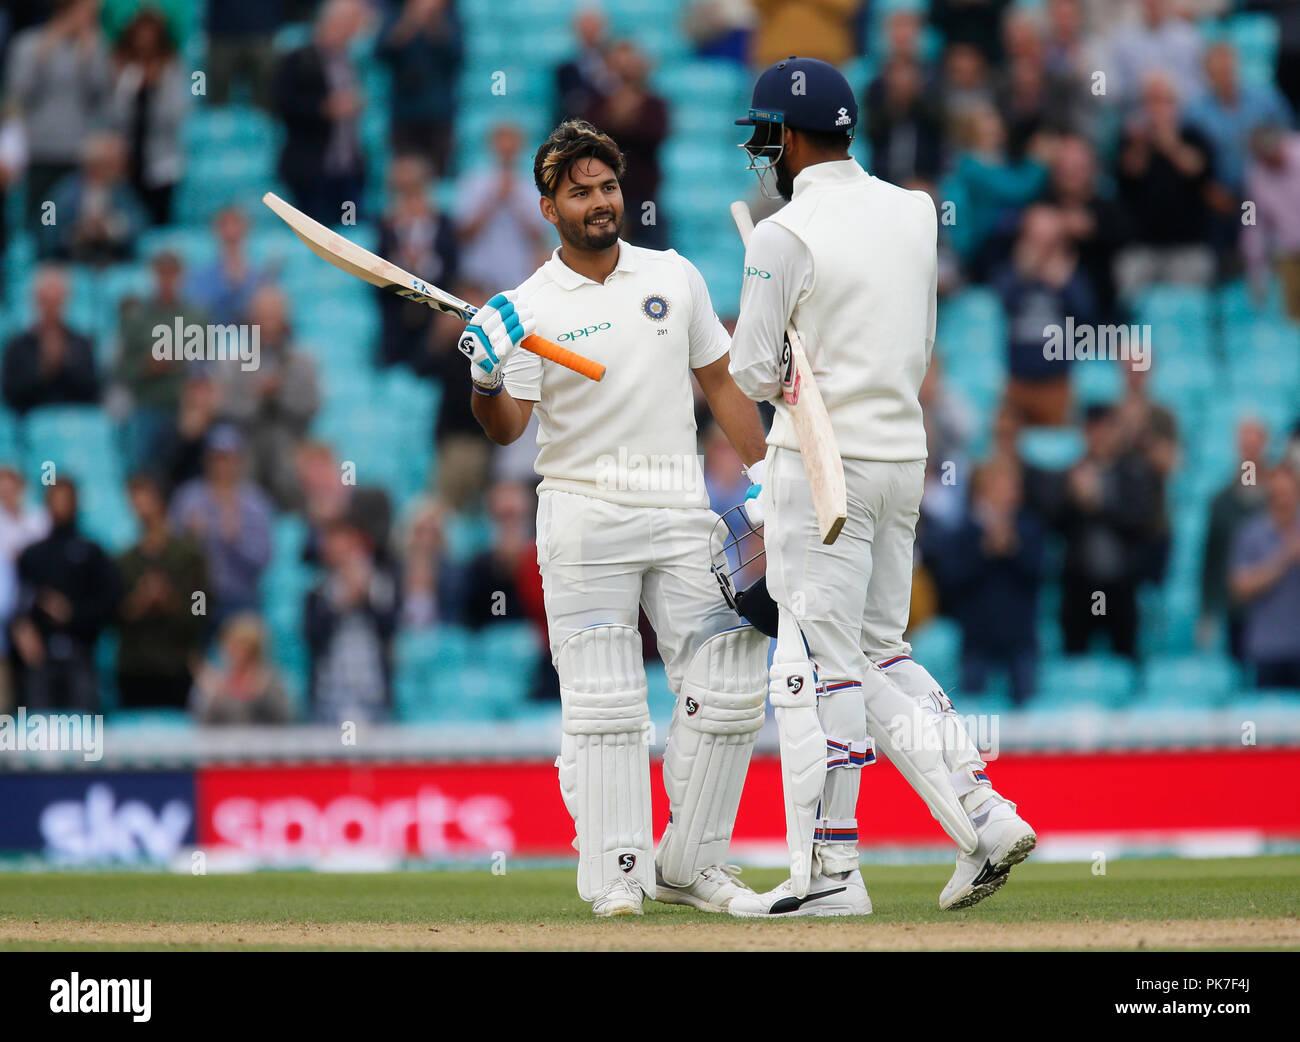 Kia Oval, London, UK. 11th Sep, 2018. Specsavers International Test Match Cricket, 5th test, day 5; KL Rahul of India congratulates batting partner Rishabh Pant on reaching his century Credit: Action Plus Sports/Alamy Live News Stock Photo